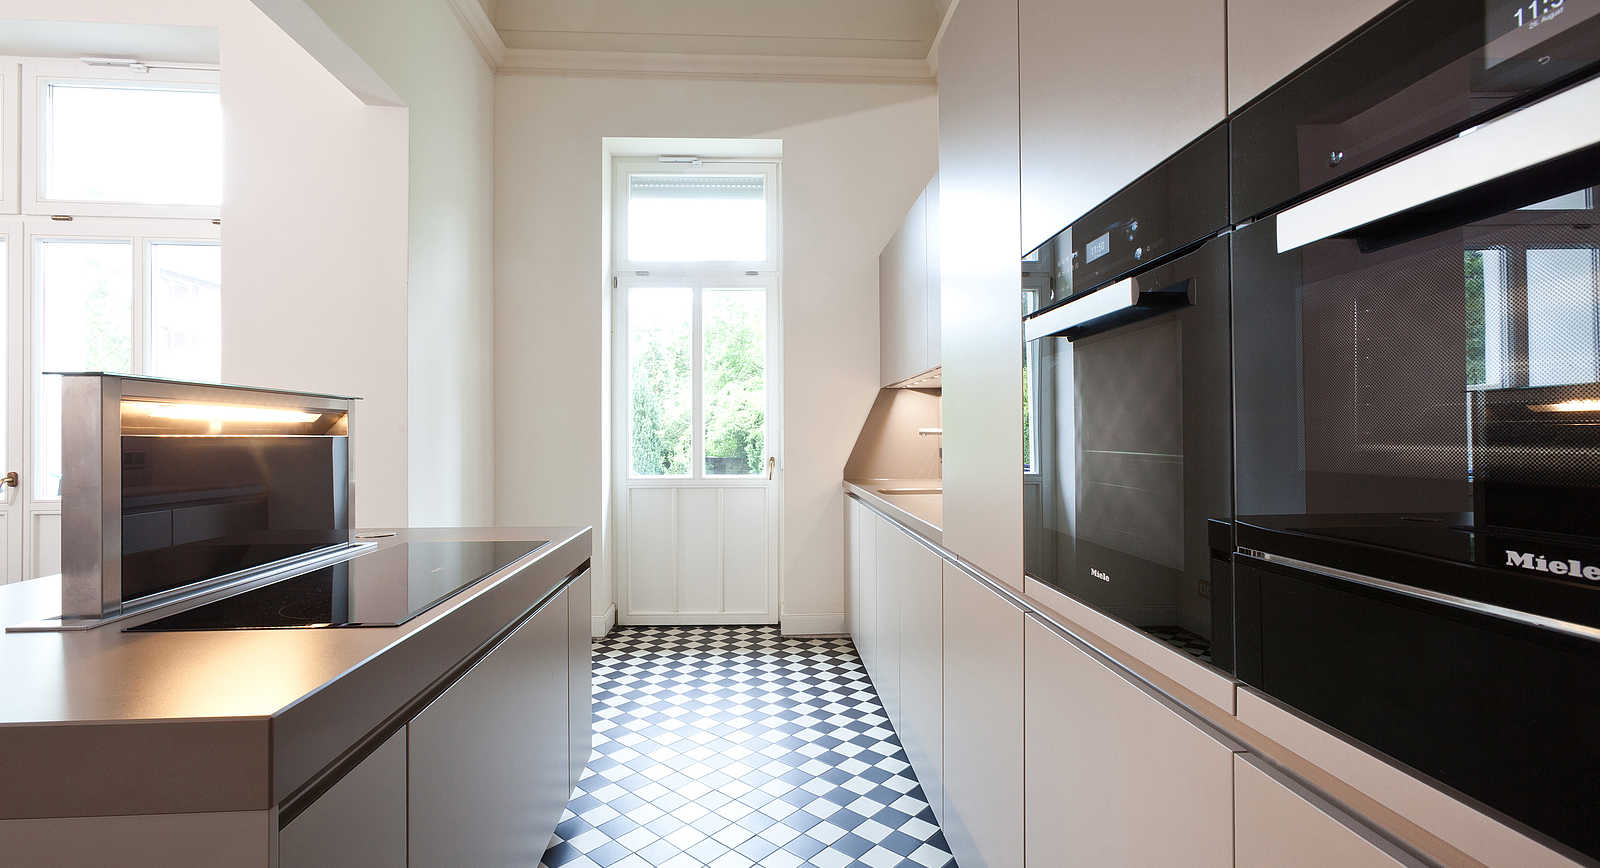 Küchengalerie Bonn ~ küche bonn bad godesberg küchen galerie bonn